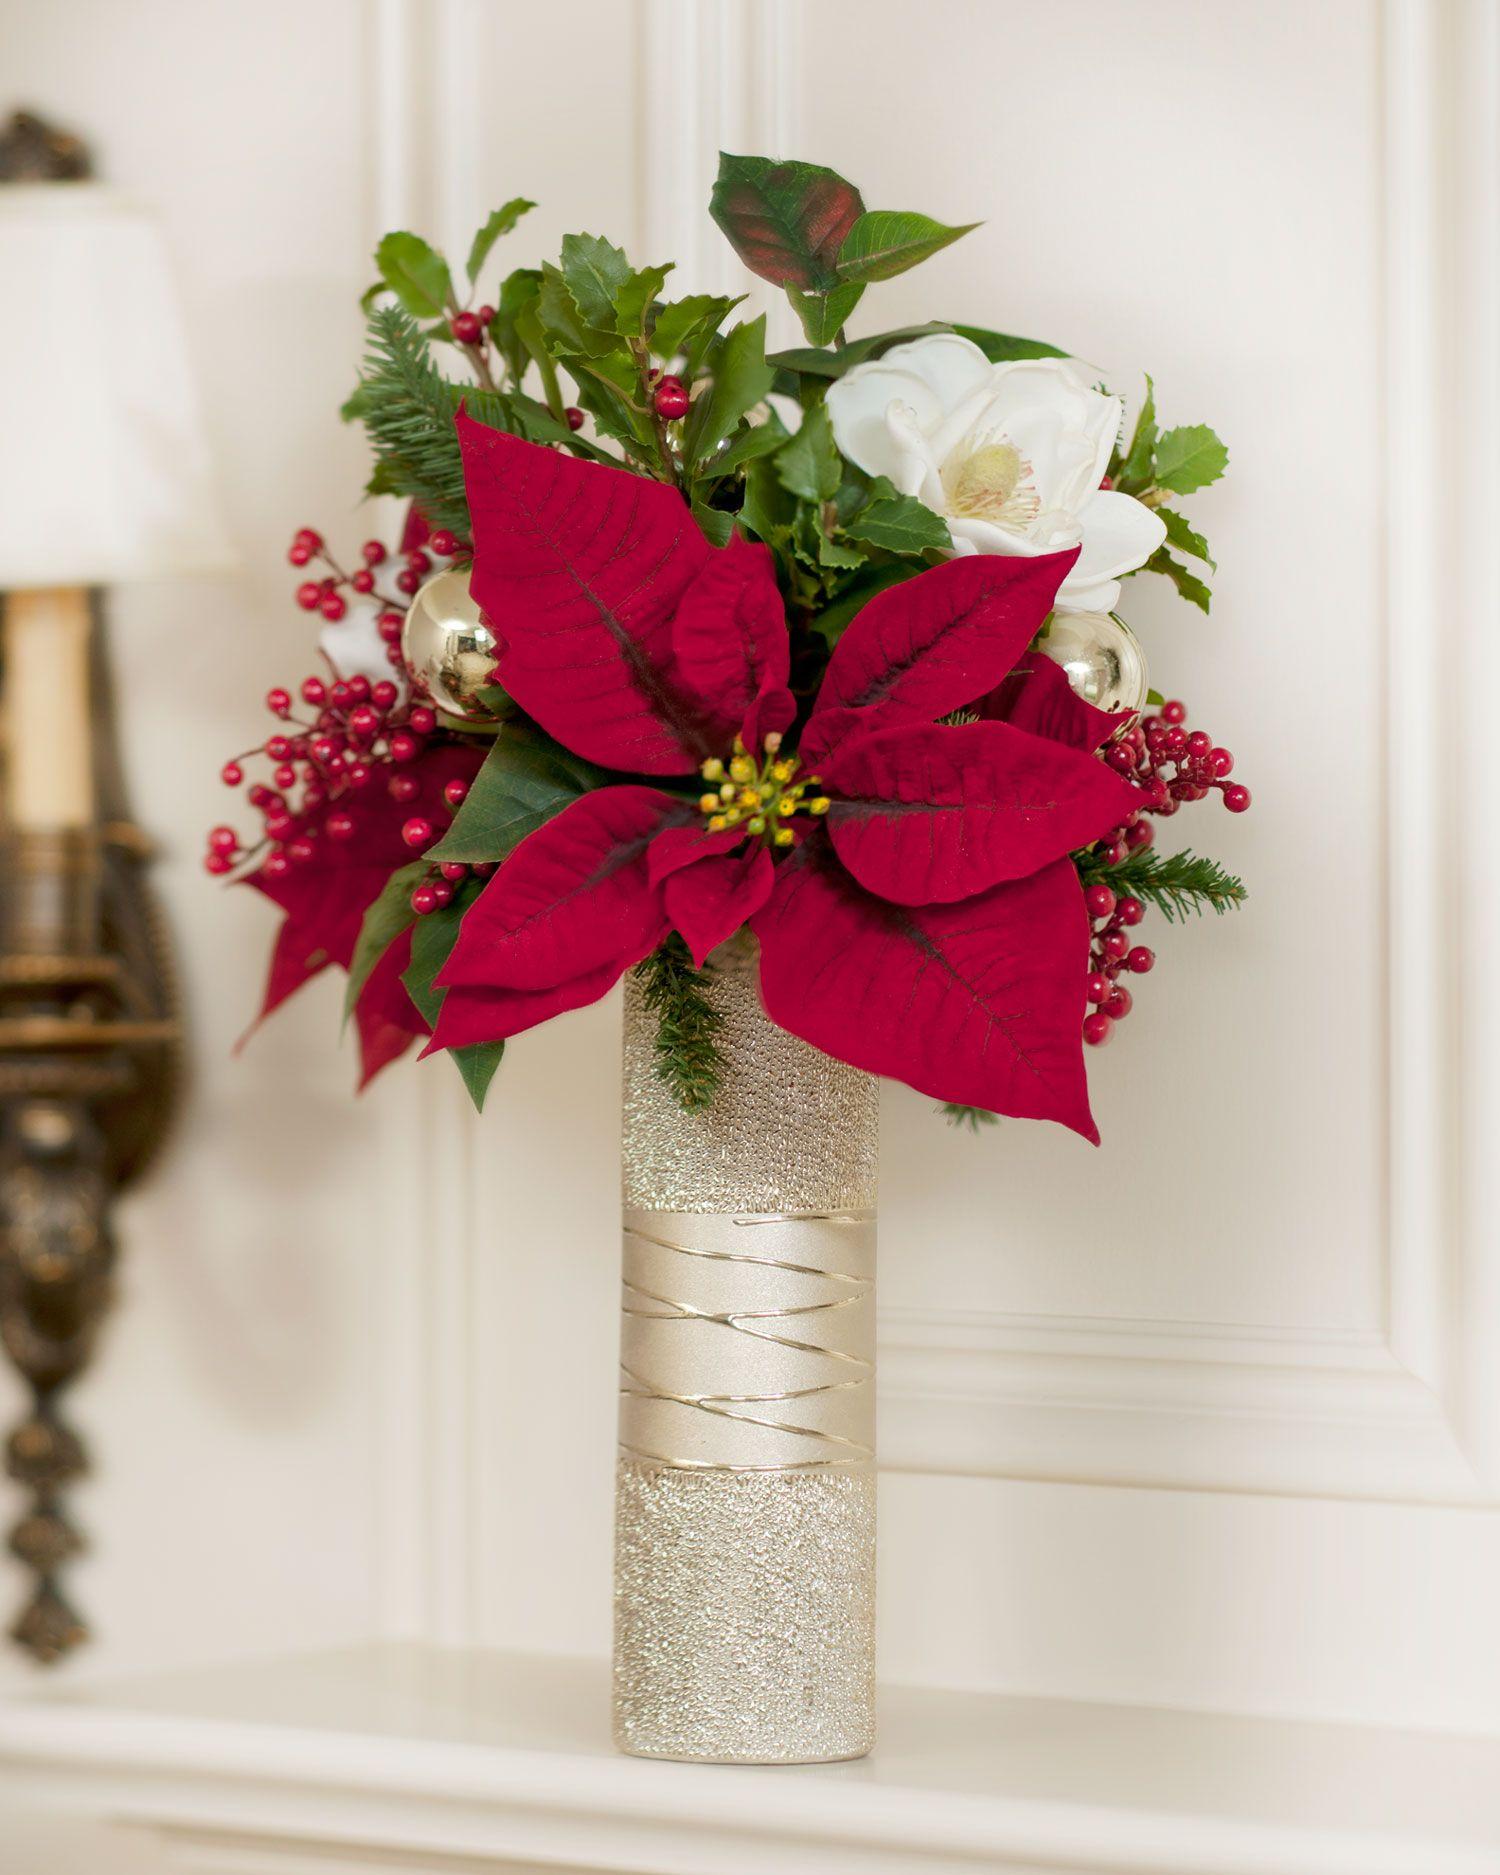 Poinsettia Magnolia Silk Flower Vase Christmas Flowers Christmas Floral Christmas Flower Arrangements